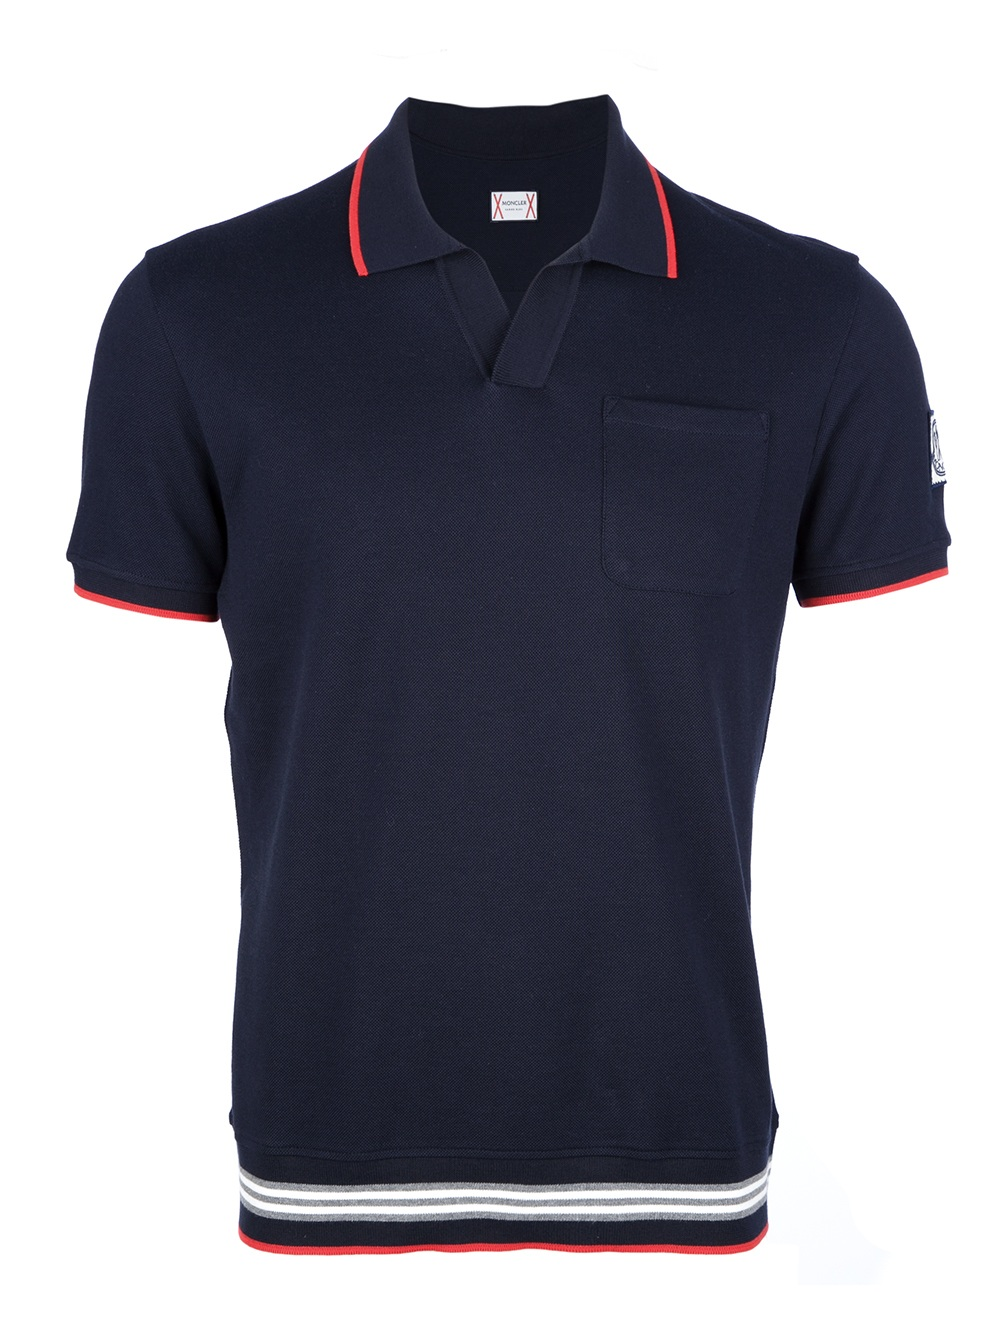 Moncler Gamme Bleu Polo Shirt In Blue For Men Lyst